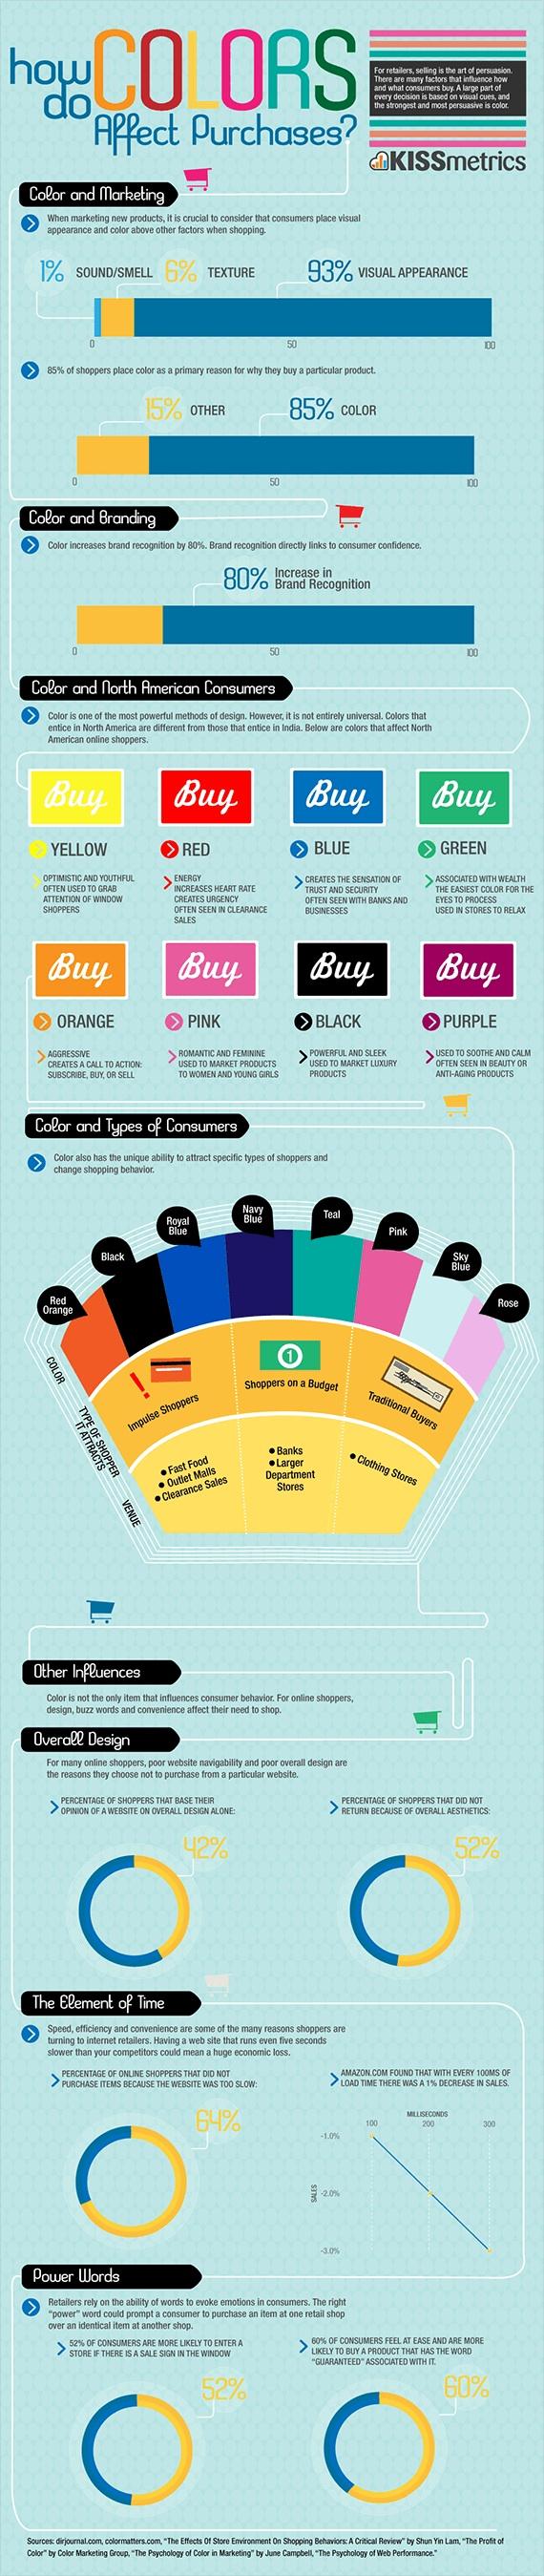 How colors effect sales???